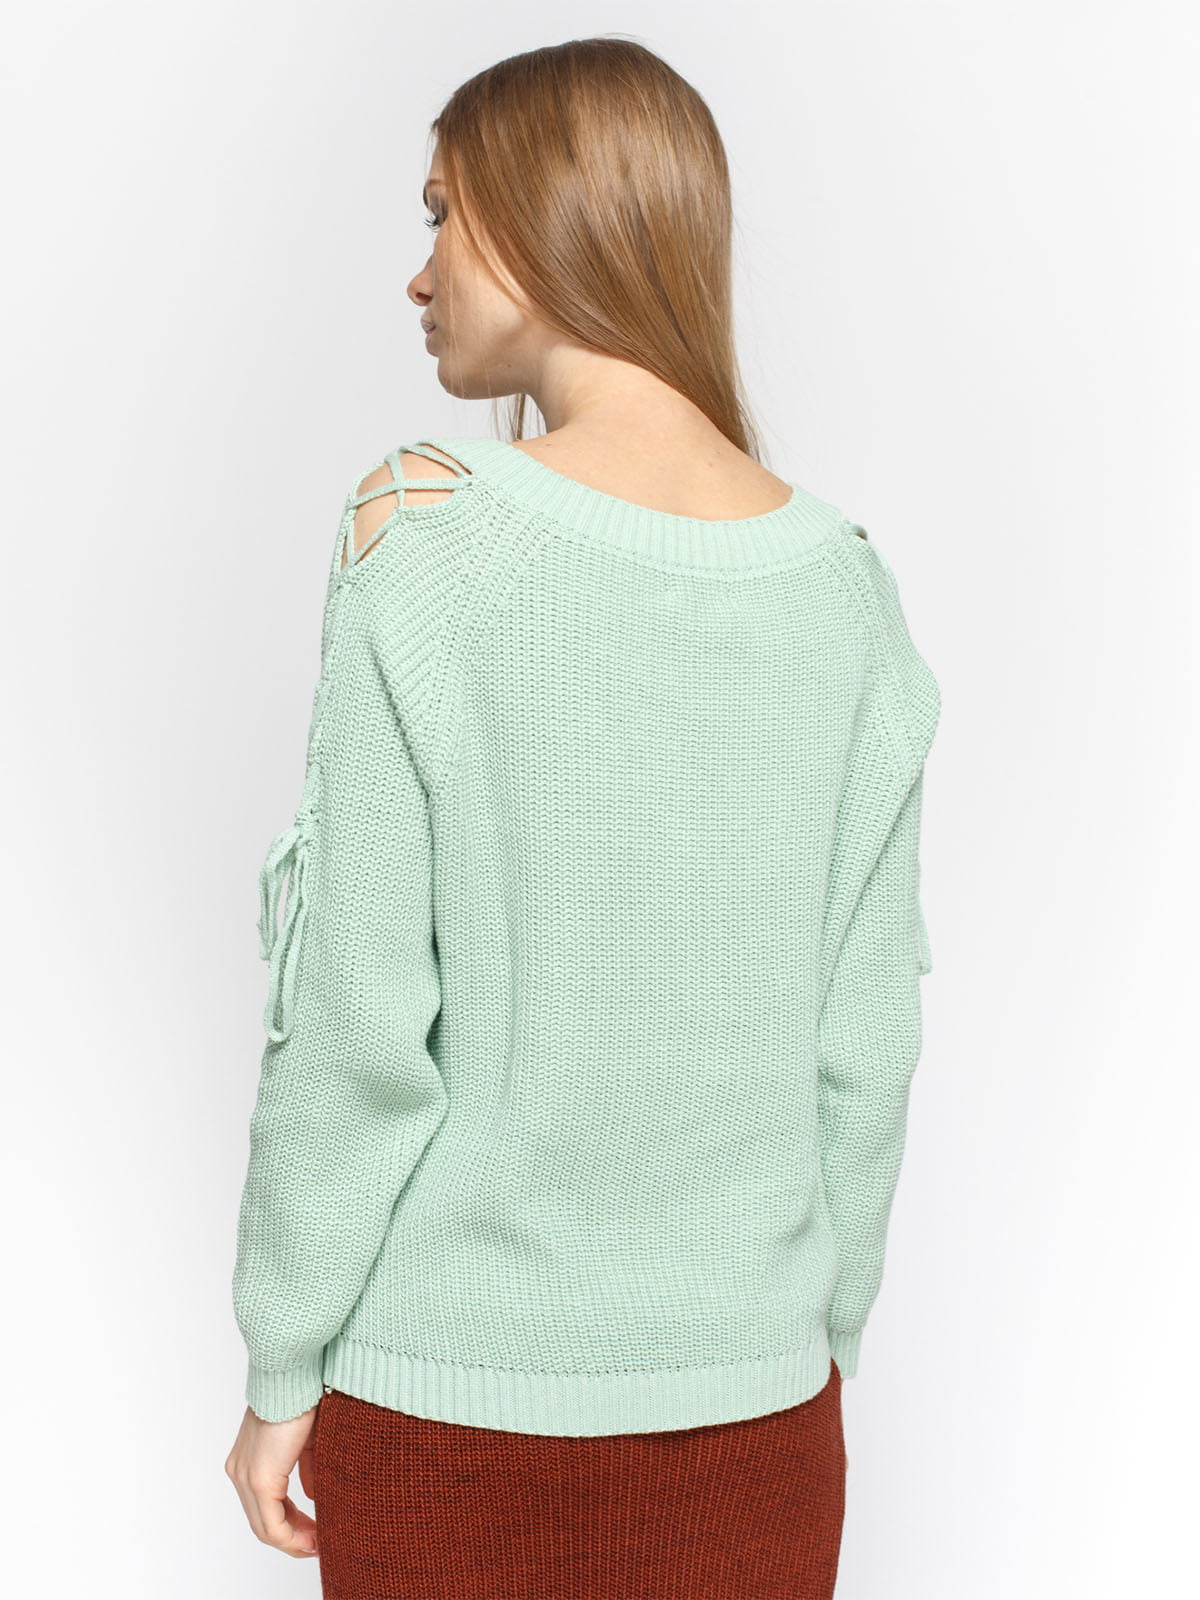 Пуловер м'ятного кольору | 4885875 | фото 2